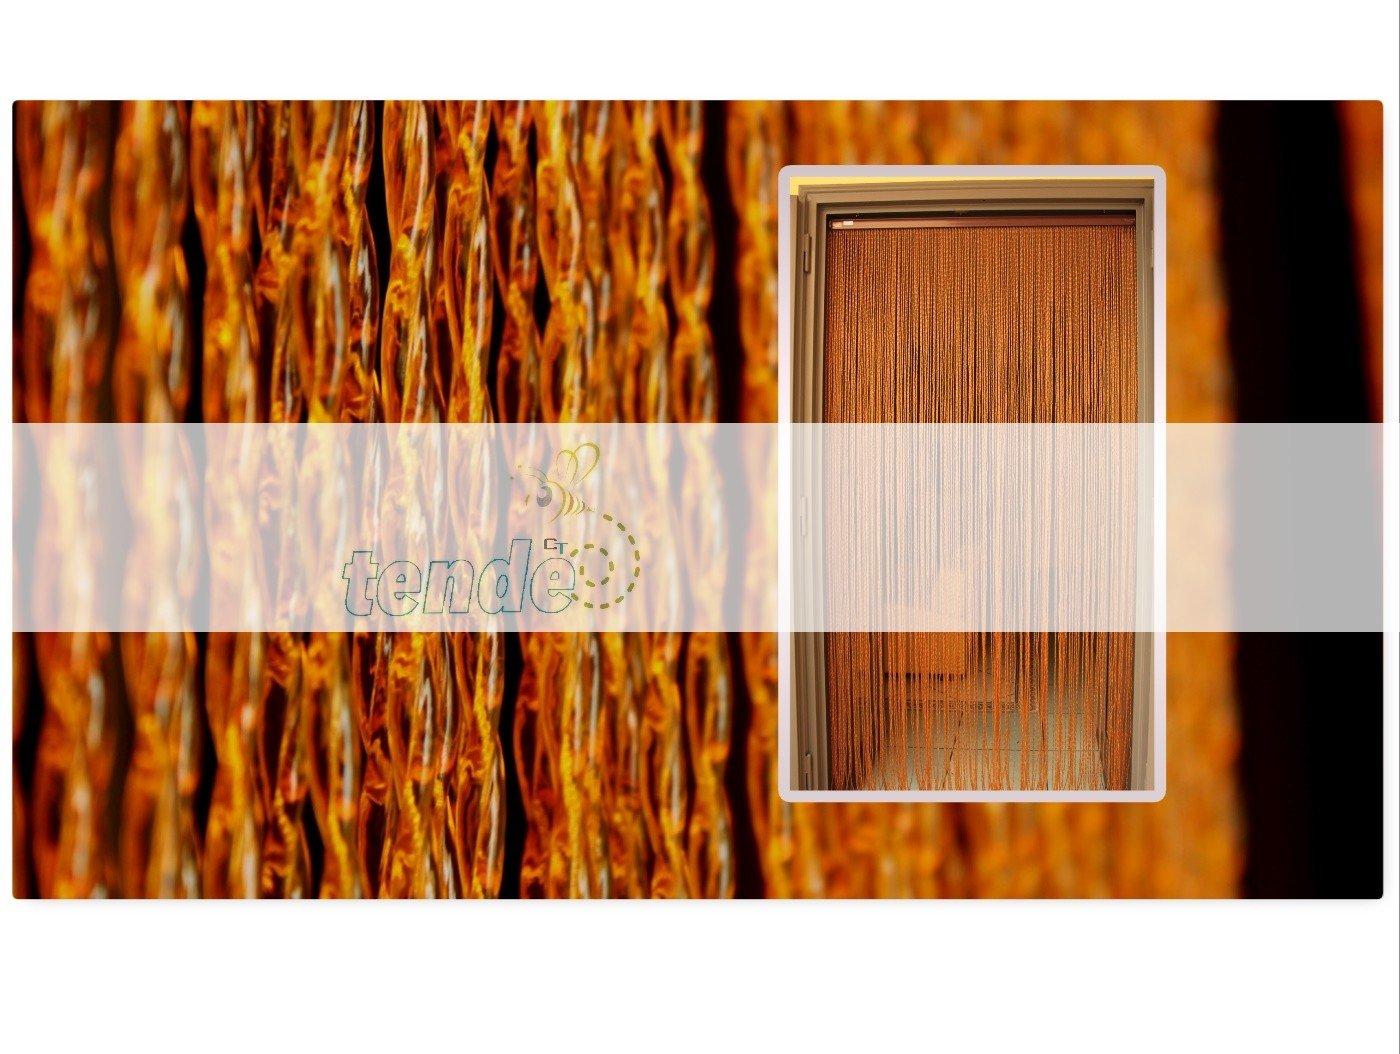 PVC-Türvorhänge Modell Roma – Aluminiumträger - Made in  - - - Eichmaß (95X200 100X220 120X230 130X240 150X250) – Fliegenvorhang (100X220, Transparent (2)) B01DYOT9B4 Fensterdekoration ec0fce